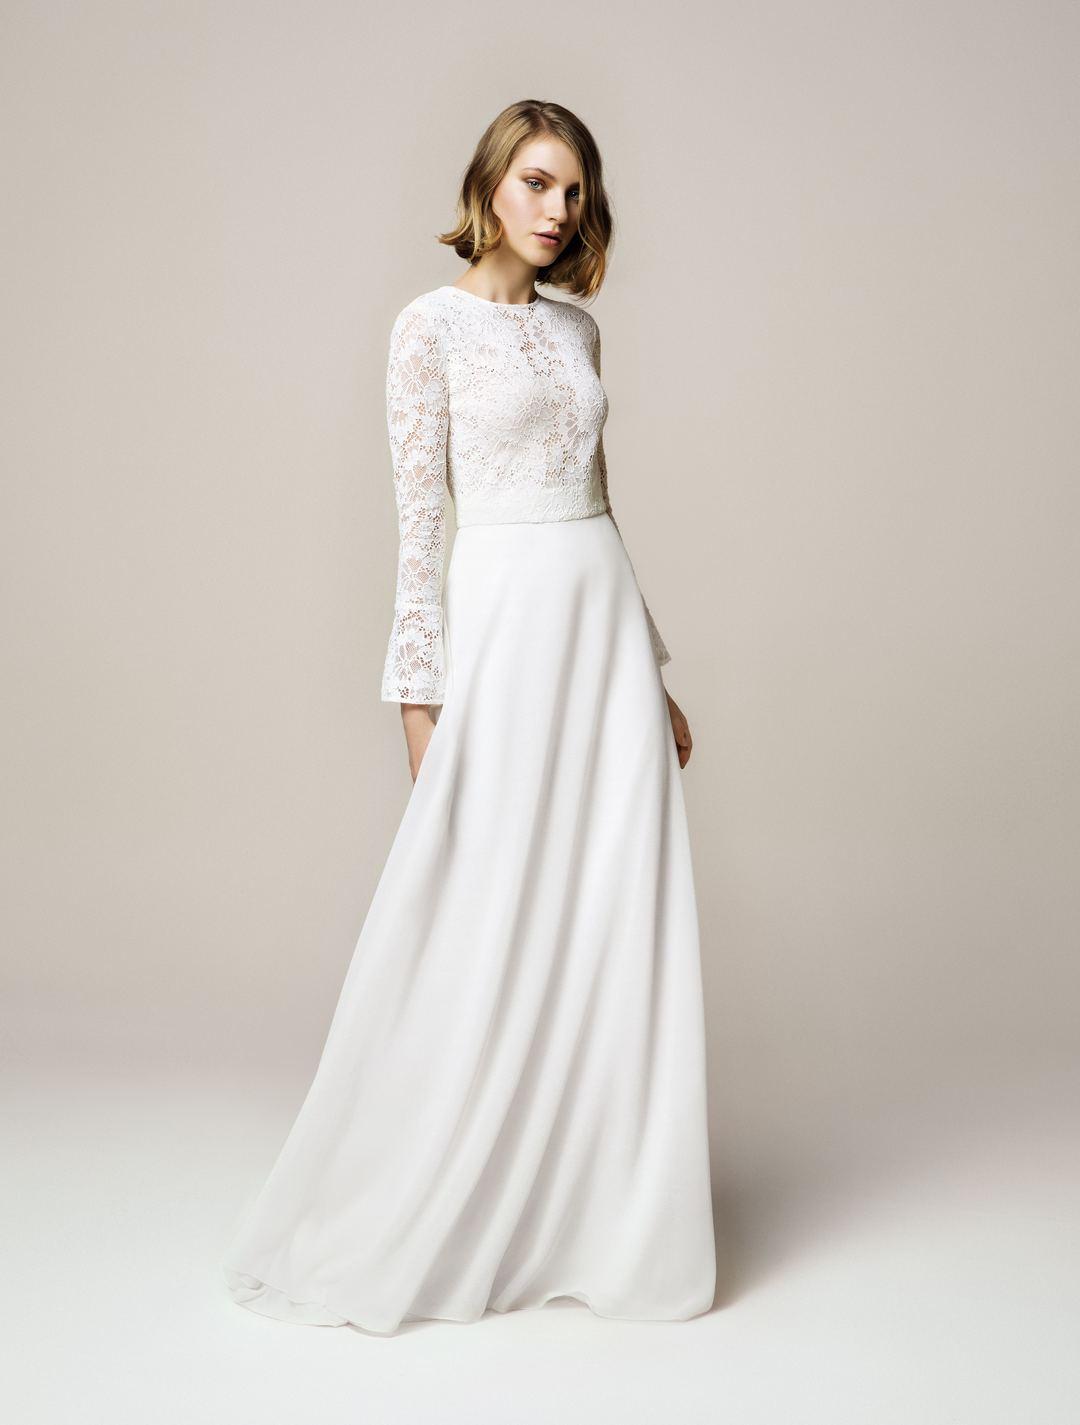 908 dress photo